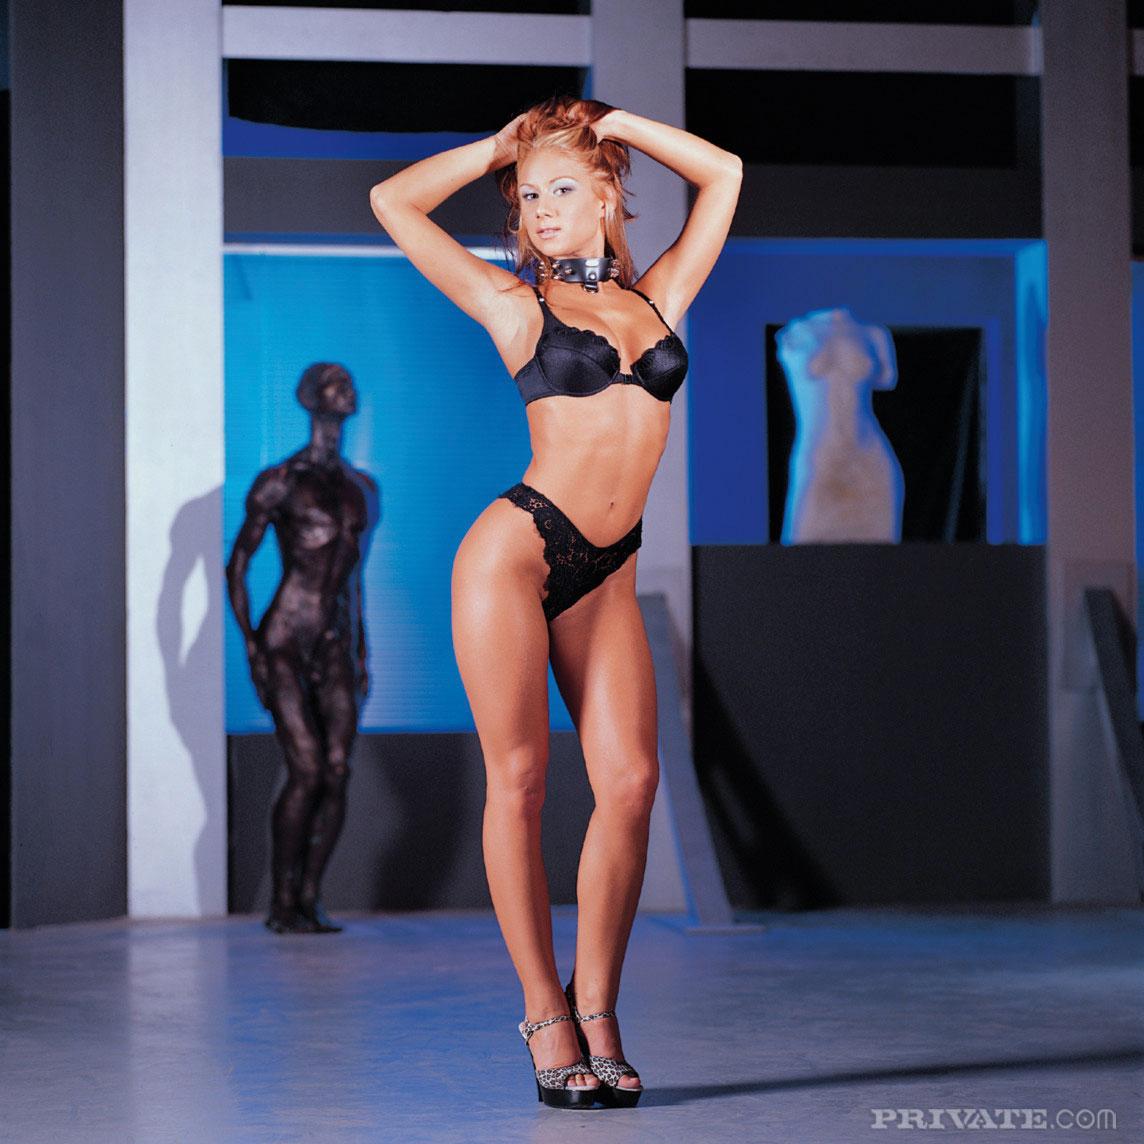 Фото моделей private 8 фотография